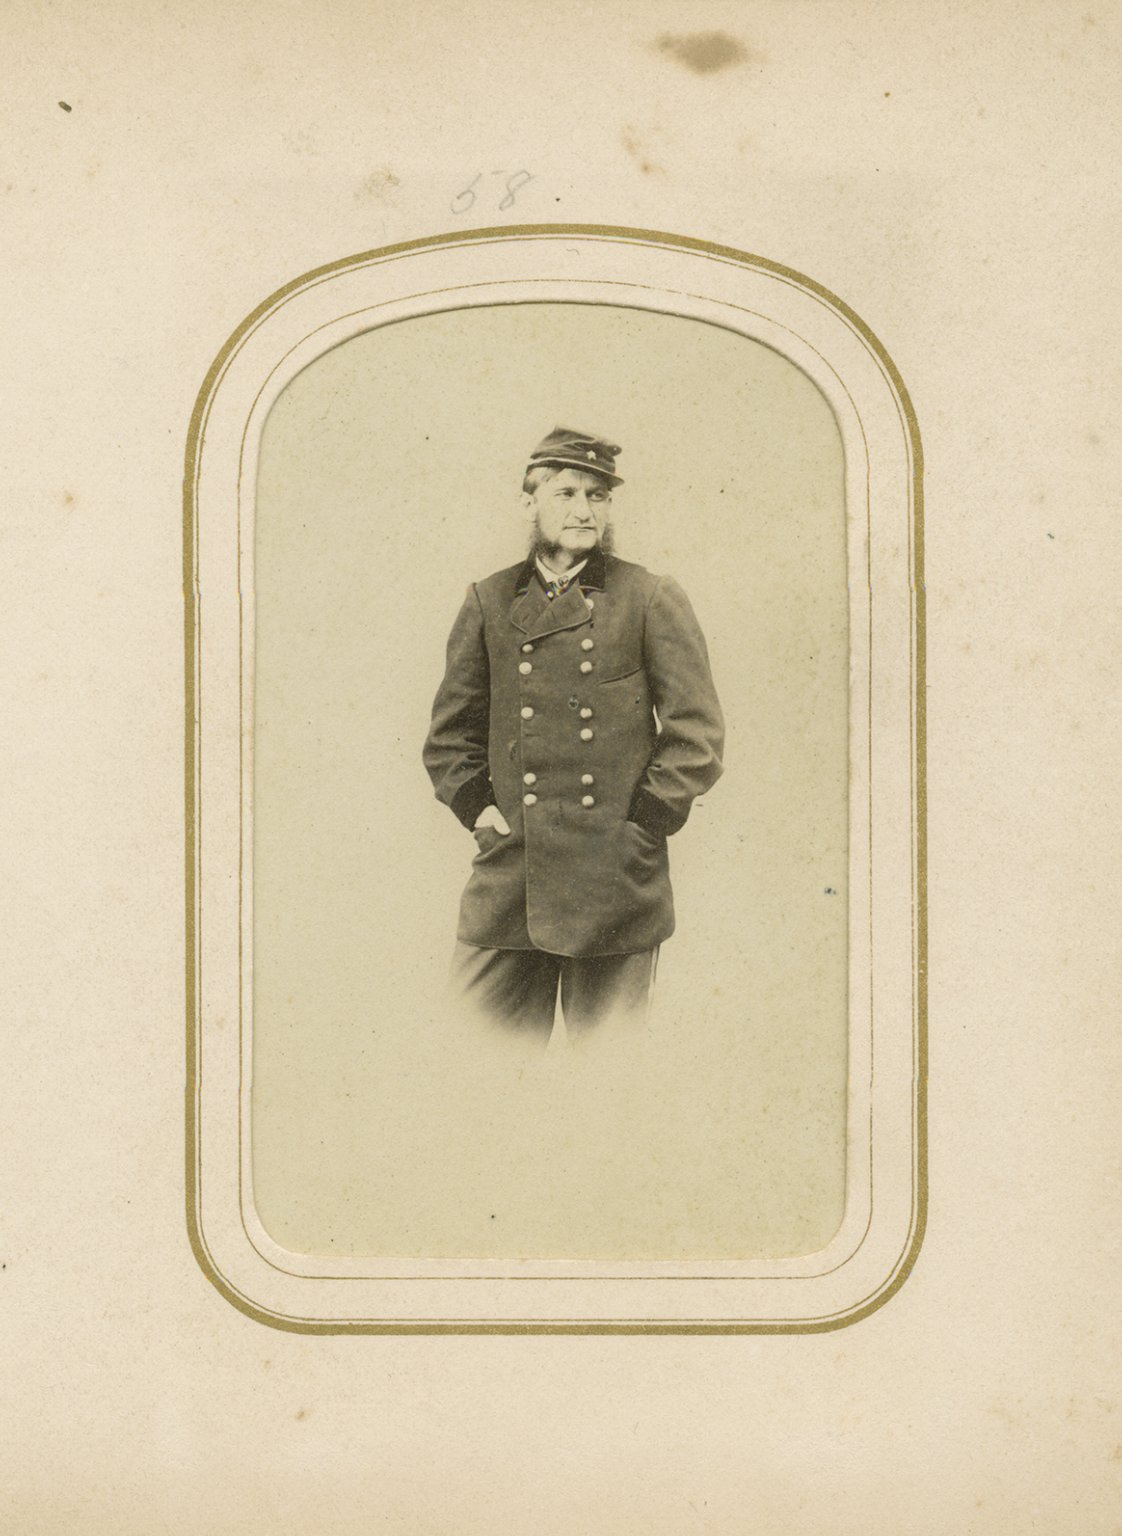 Gen. Kilpatrick